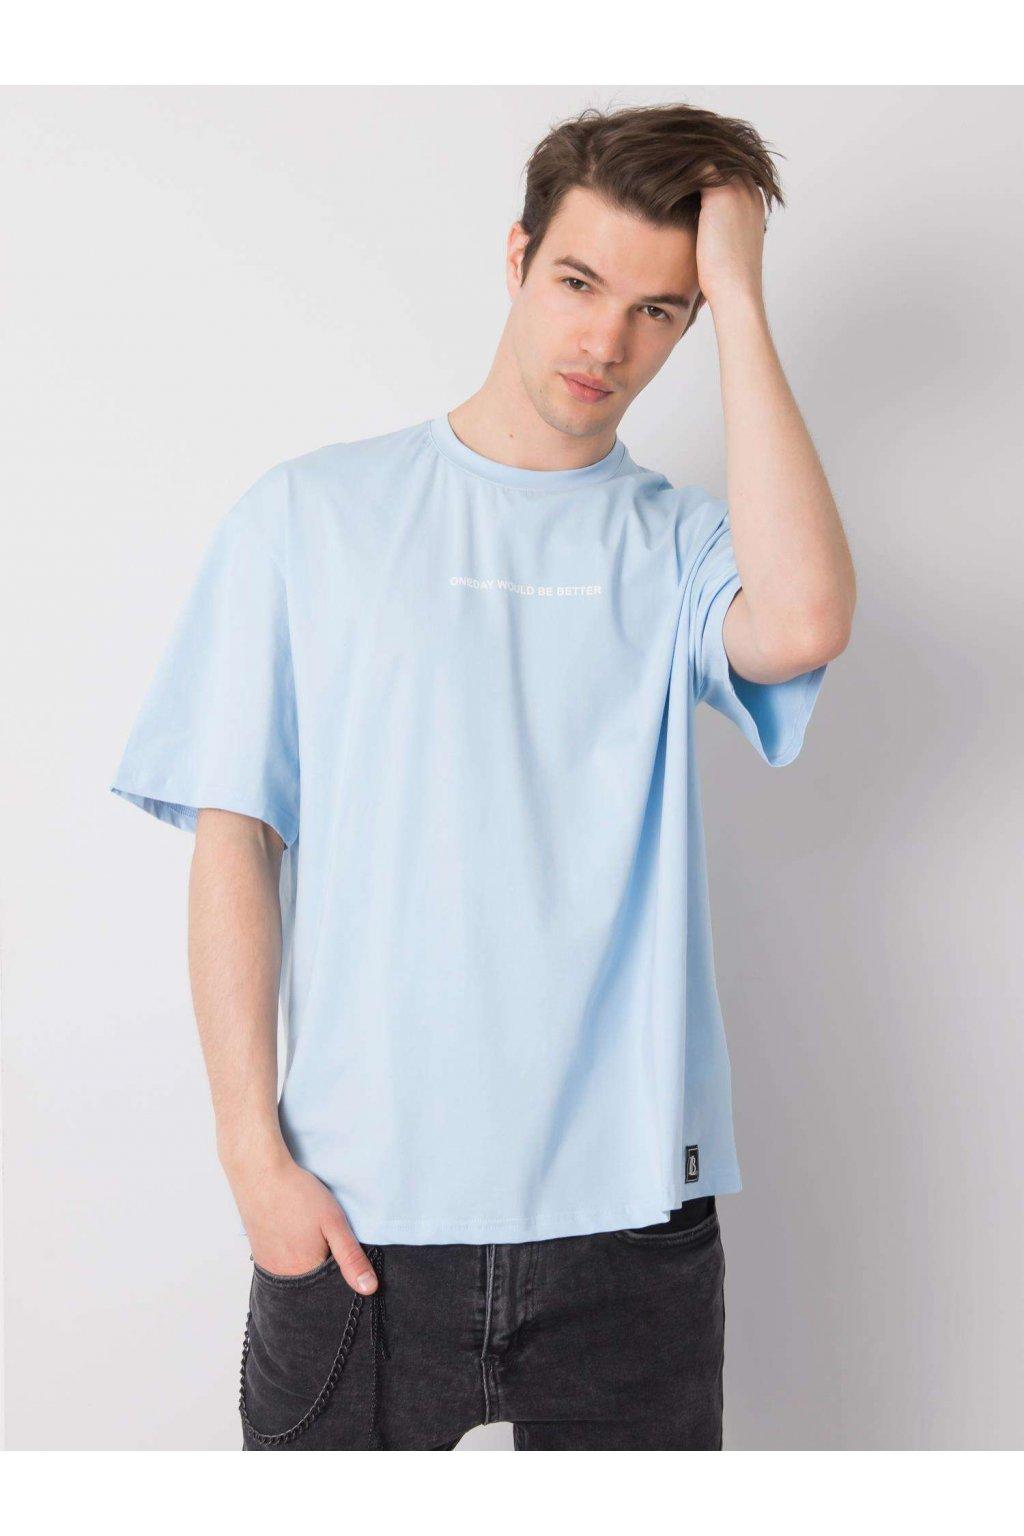 Pánske tričko t-shirt kód TSKK-Y21-0000155